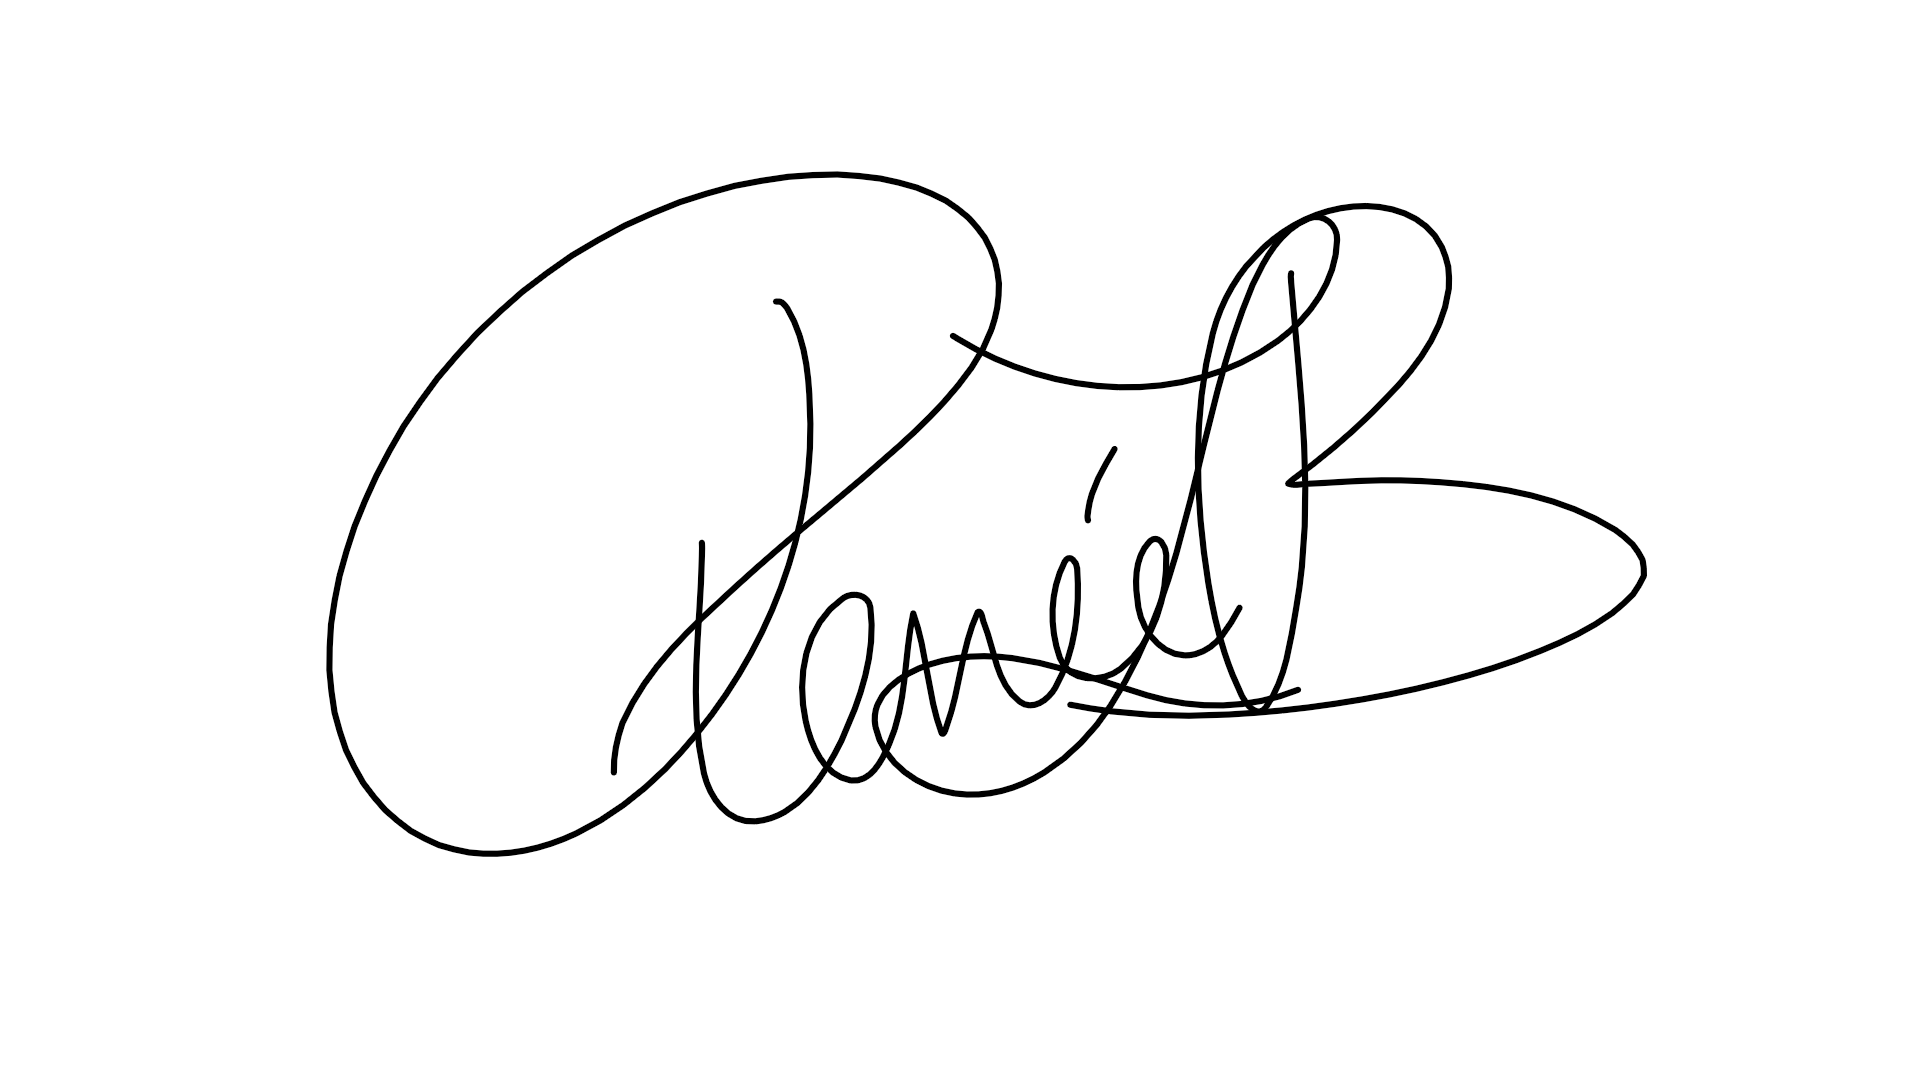 Renee Bauman's Signature